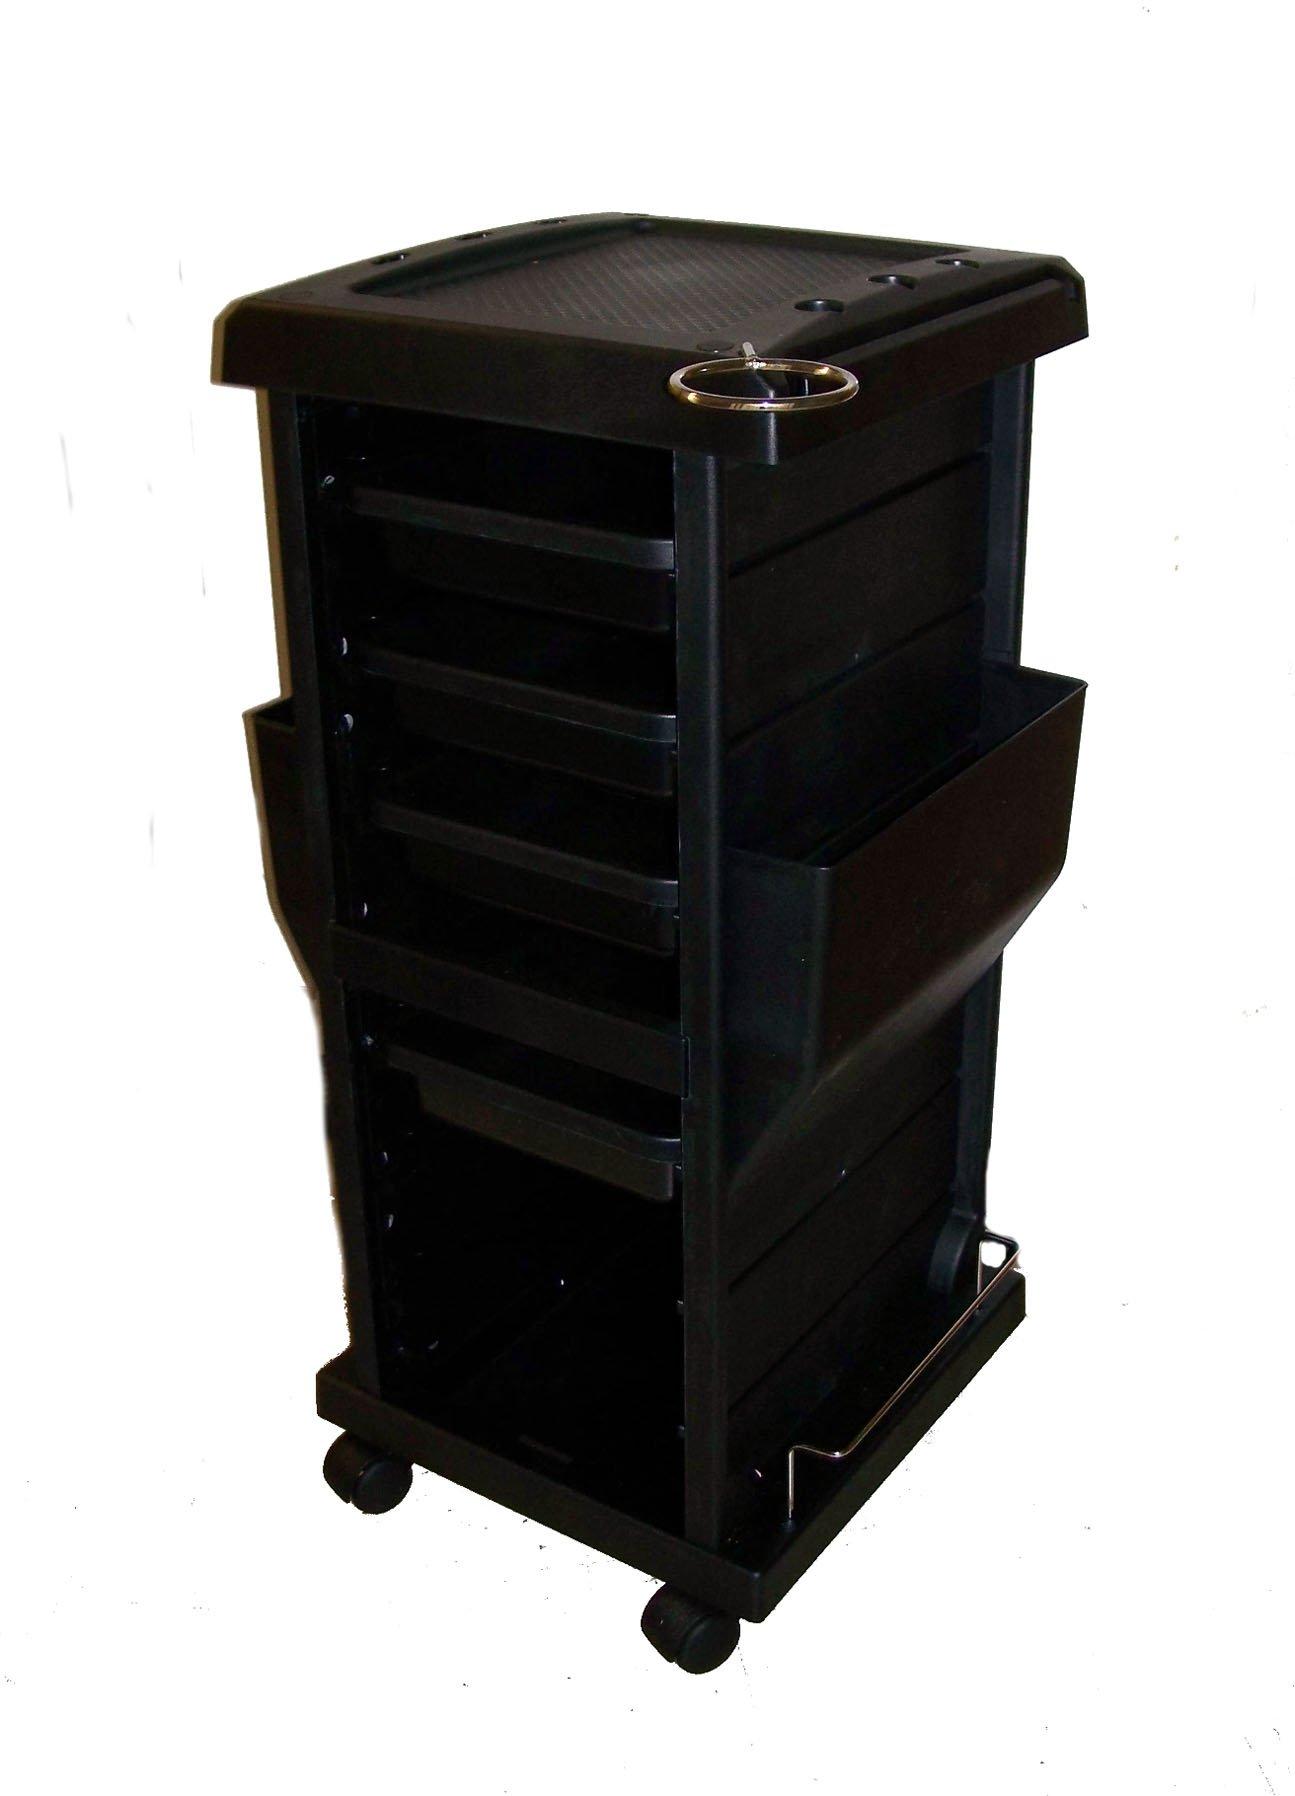 Rollabout Black Haircolor Accessory Beauty Salon Storage Cart 34'' X 17'' X 15''